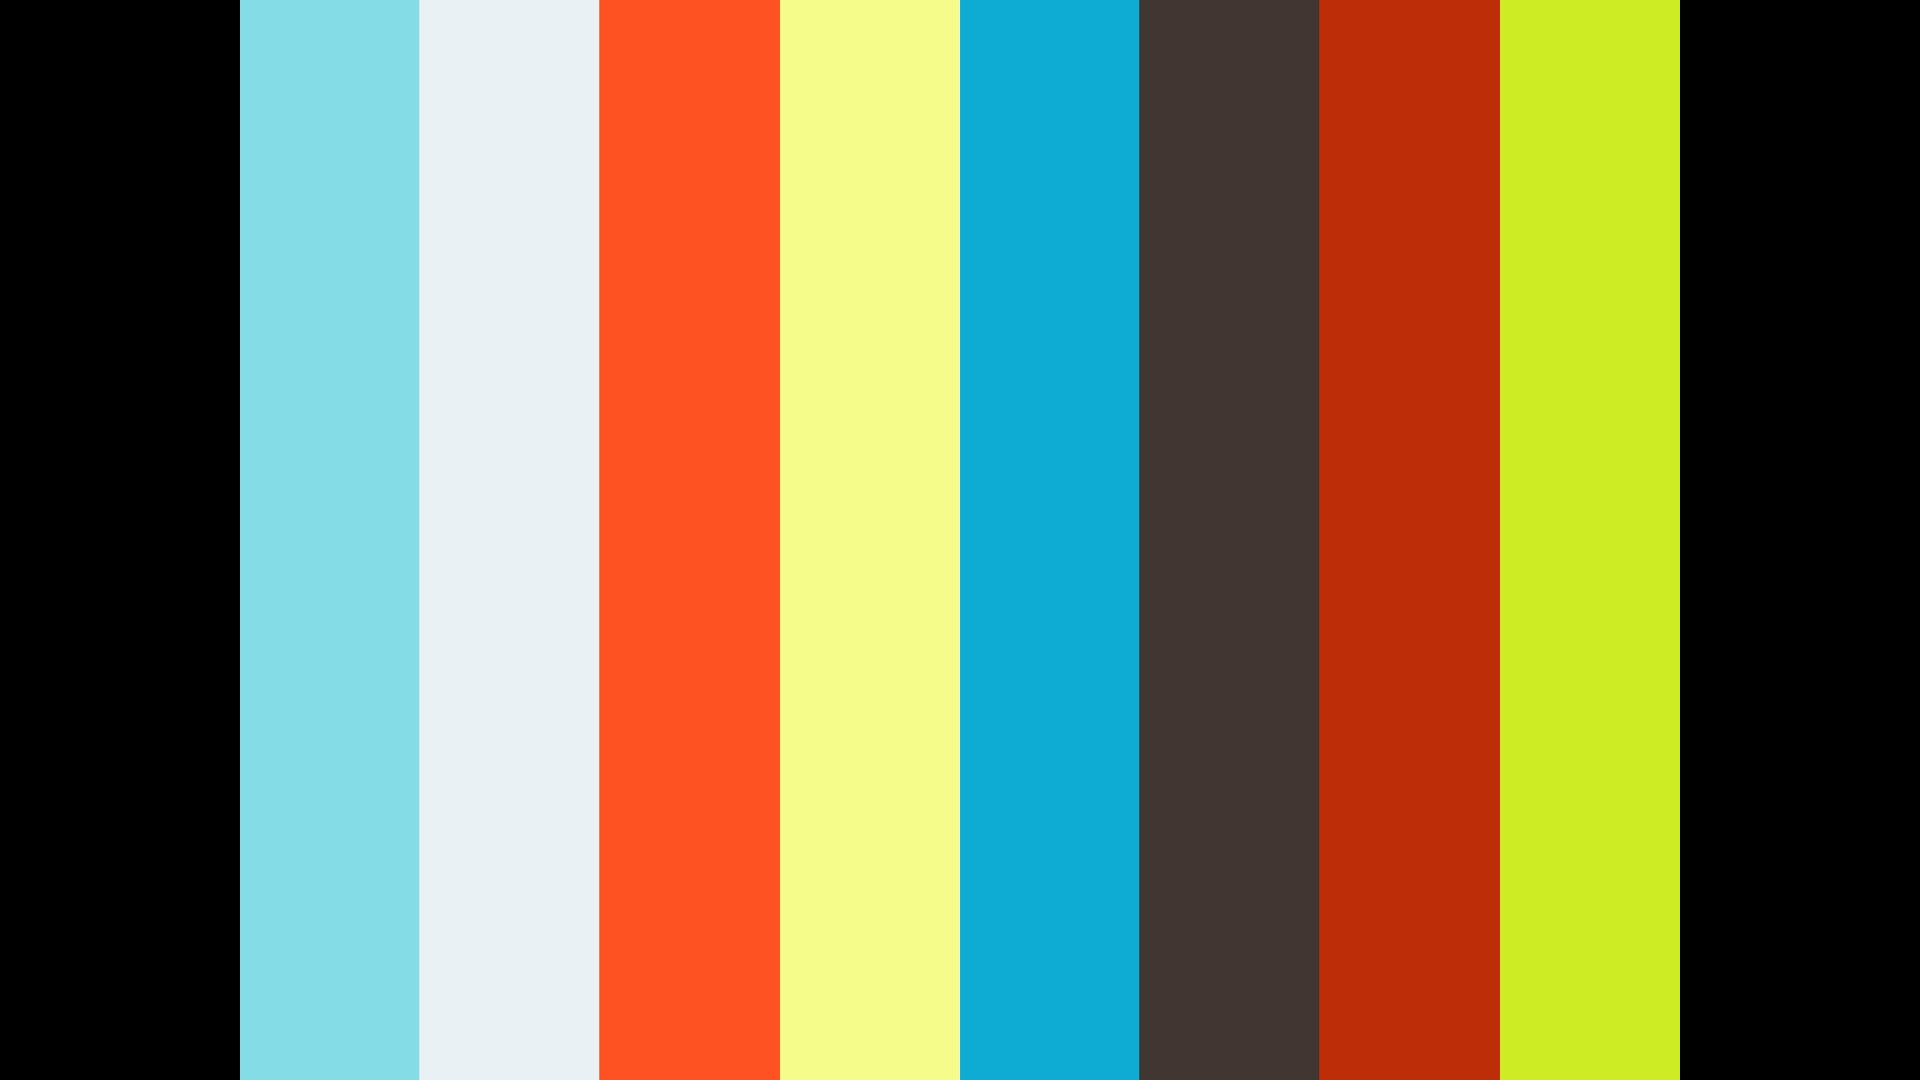 TIFFANY - ABSOLUTE 45 (28 JULY 2021)